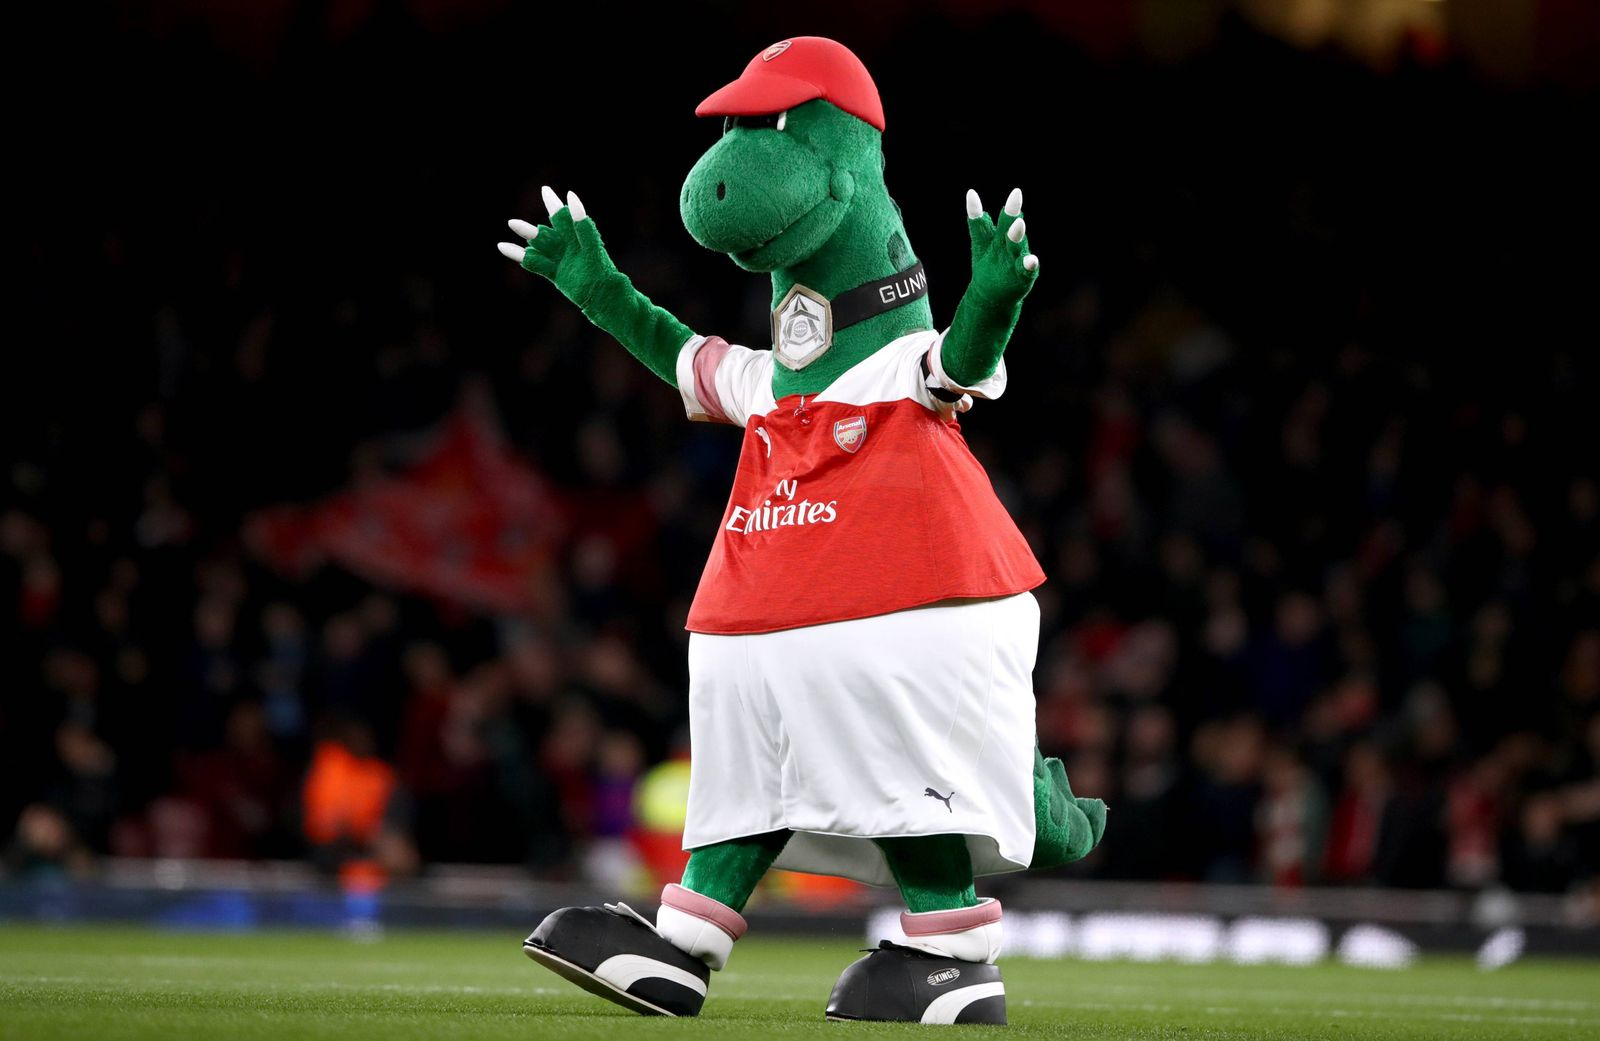 Arsenal v Liverpool - Premier League - Emirates Stadium Arsenal mascot Gunnersaurus waves to fans prior to the match ki